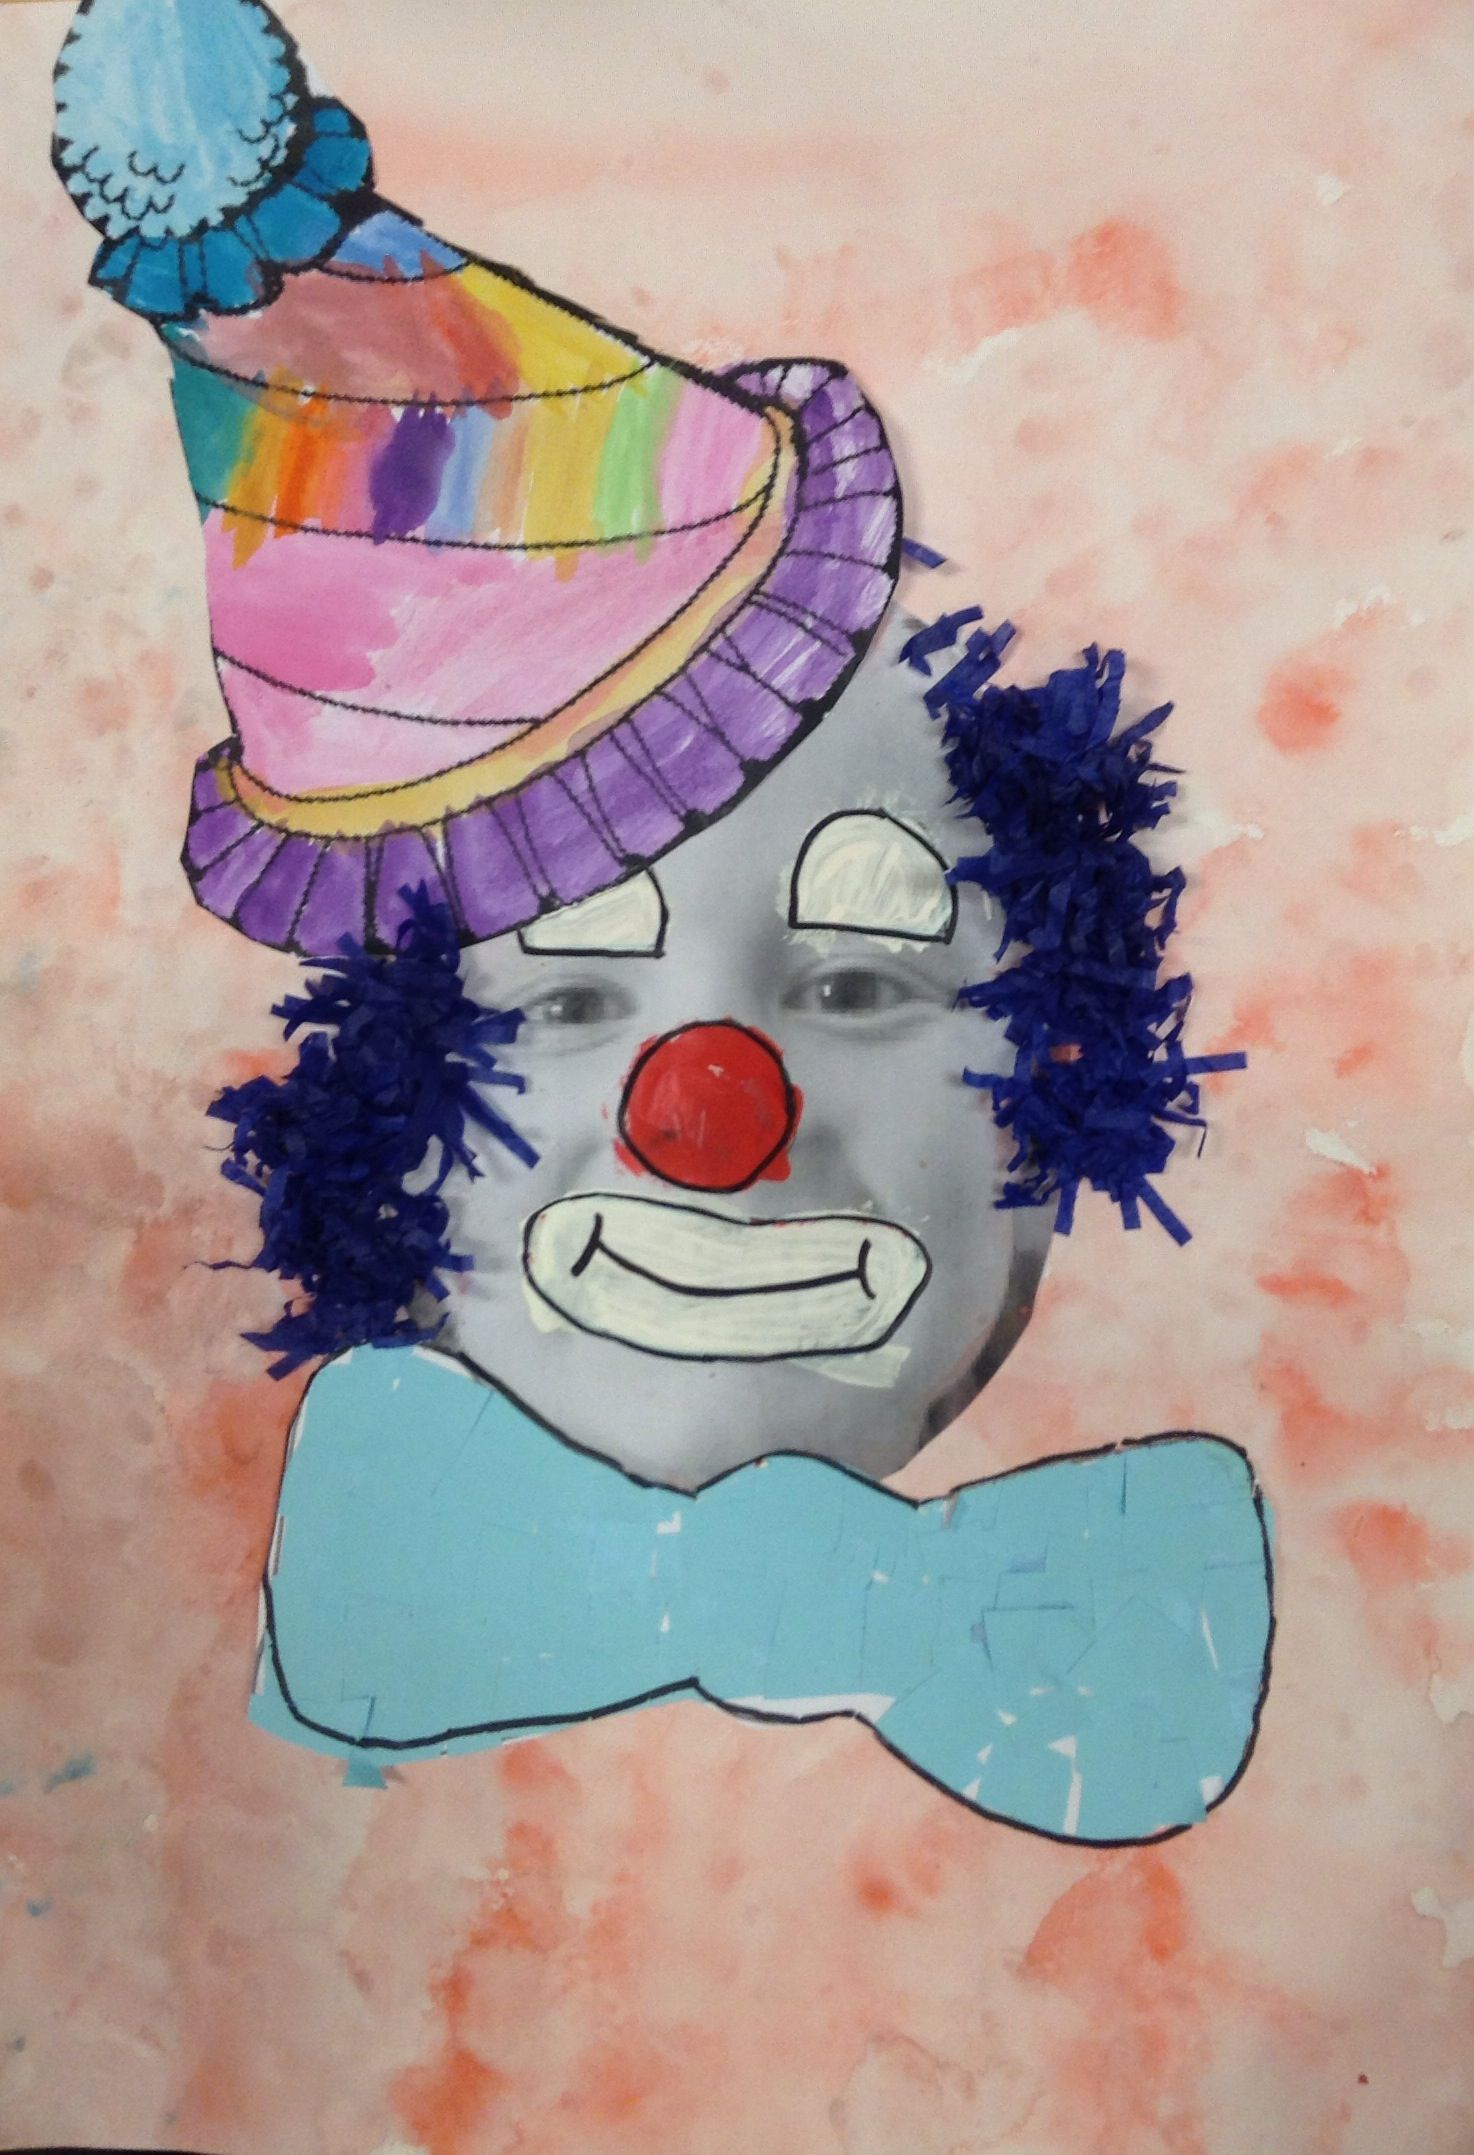 Картинки клоунов для срисовки